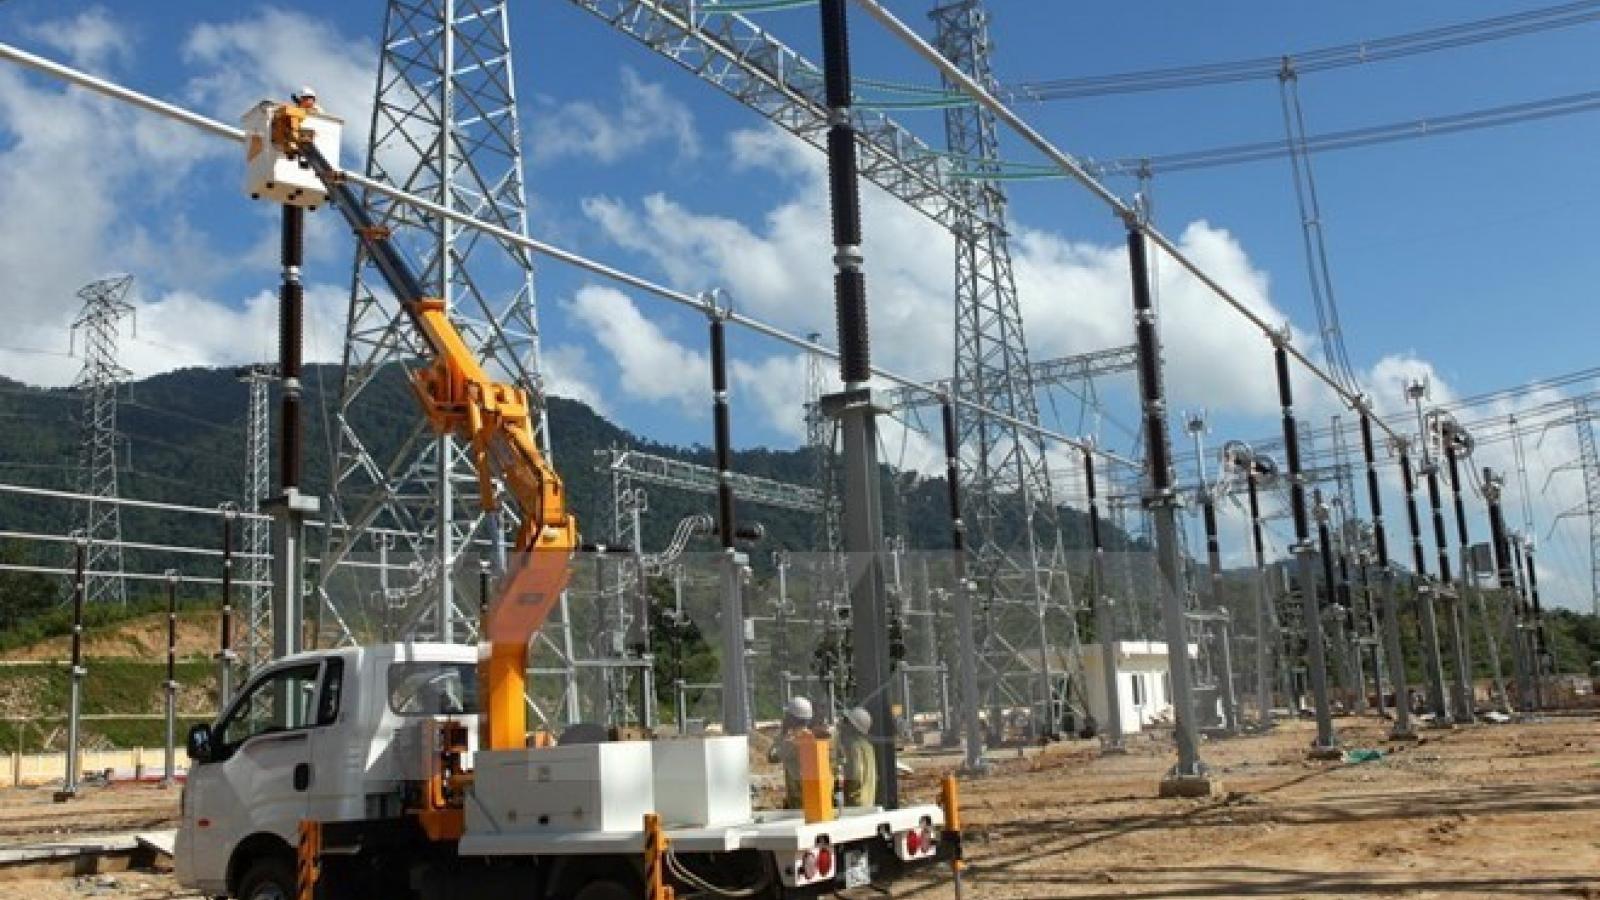 EVN assures power supplies amid prolonged drought